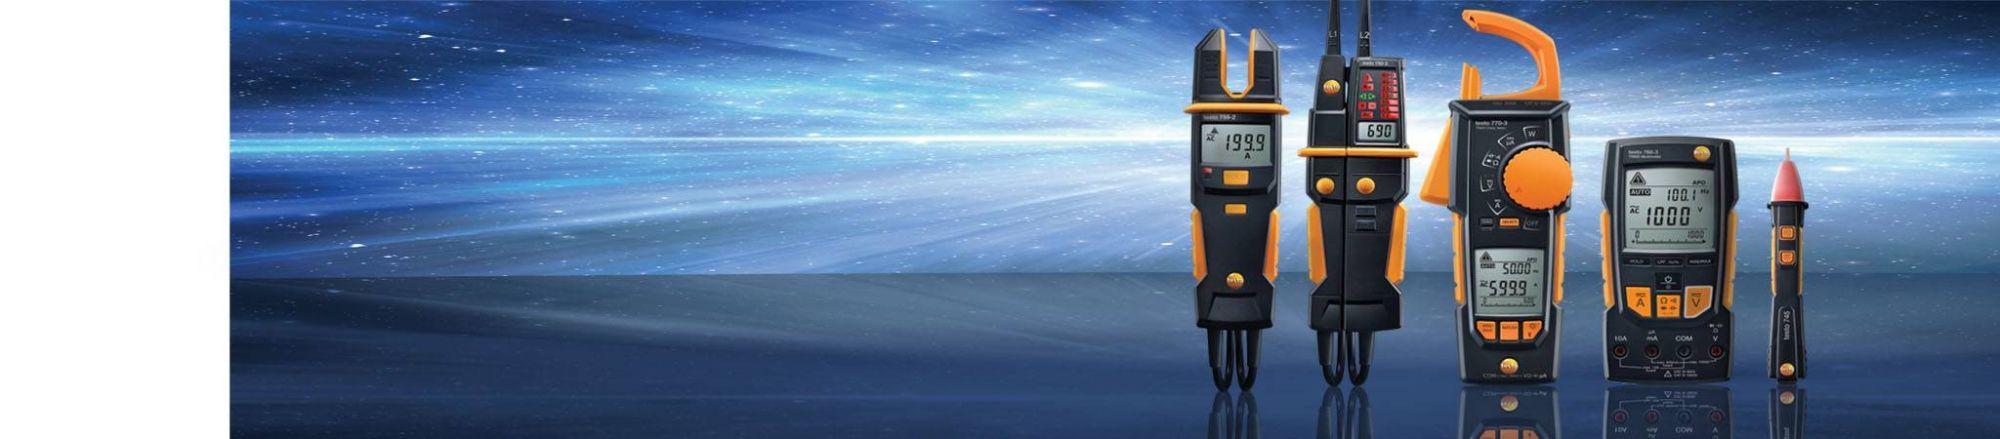 Tehnologia <br />măsurătorilor<br /> electrice. <br /><strong>Reinventată </strong>